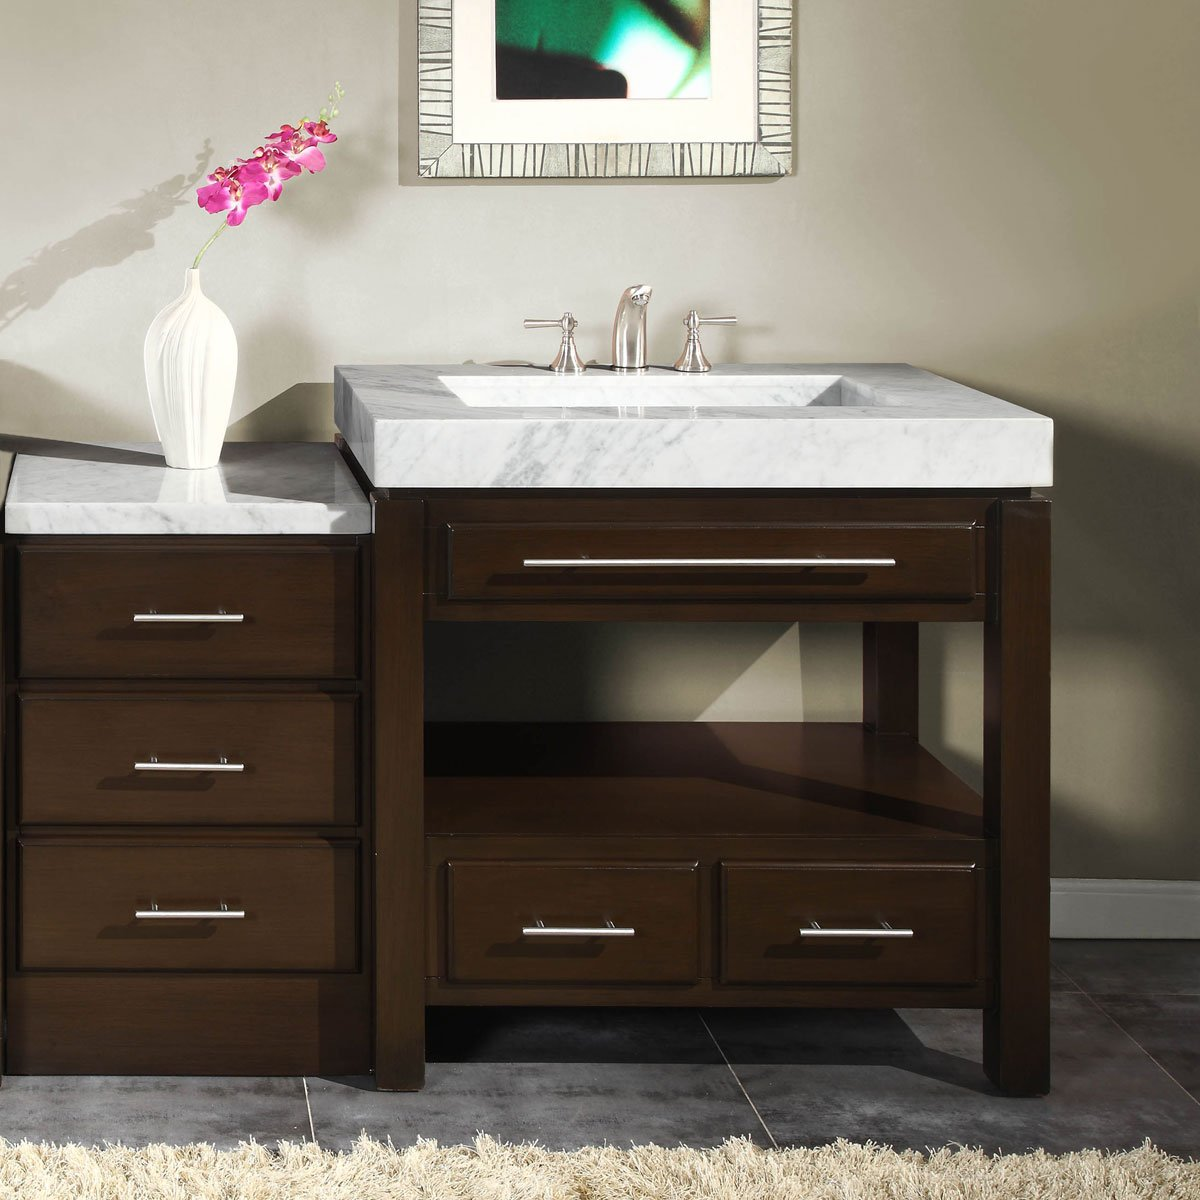 Silkroad Exclusive Marble Top Sink Bathroom Vanity with Modern Furniture Cabinet, 56-Inch